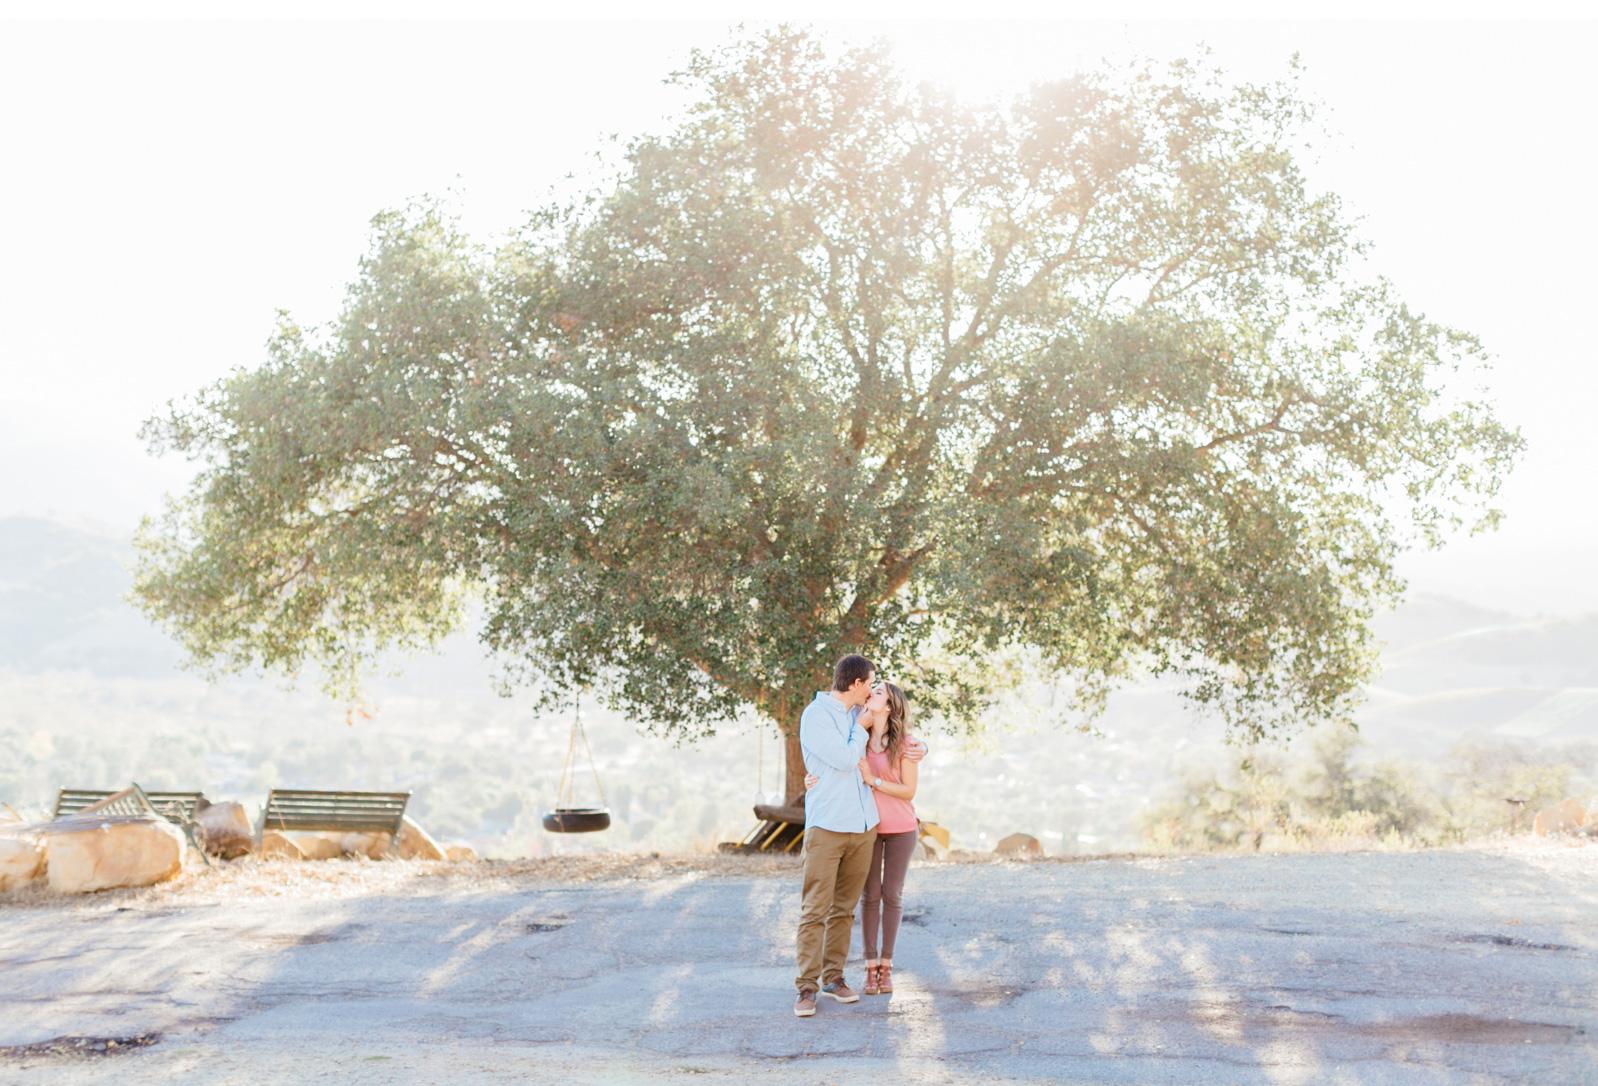 San-Luis-Obispo-Wedding-Photographer-Natalie-Schutt-Photography_18.jpg